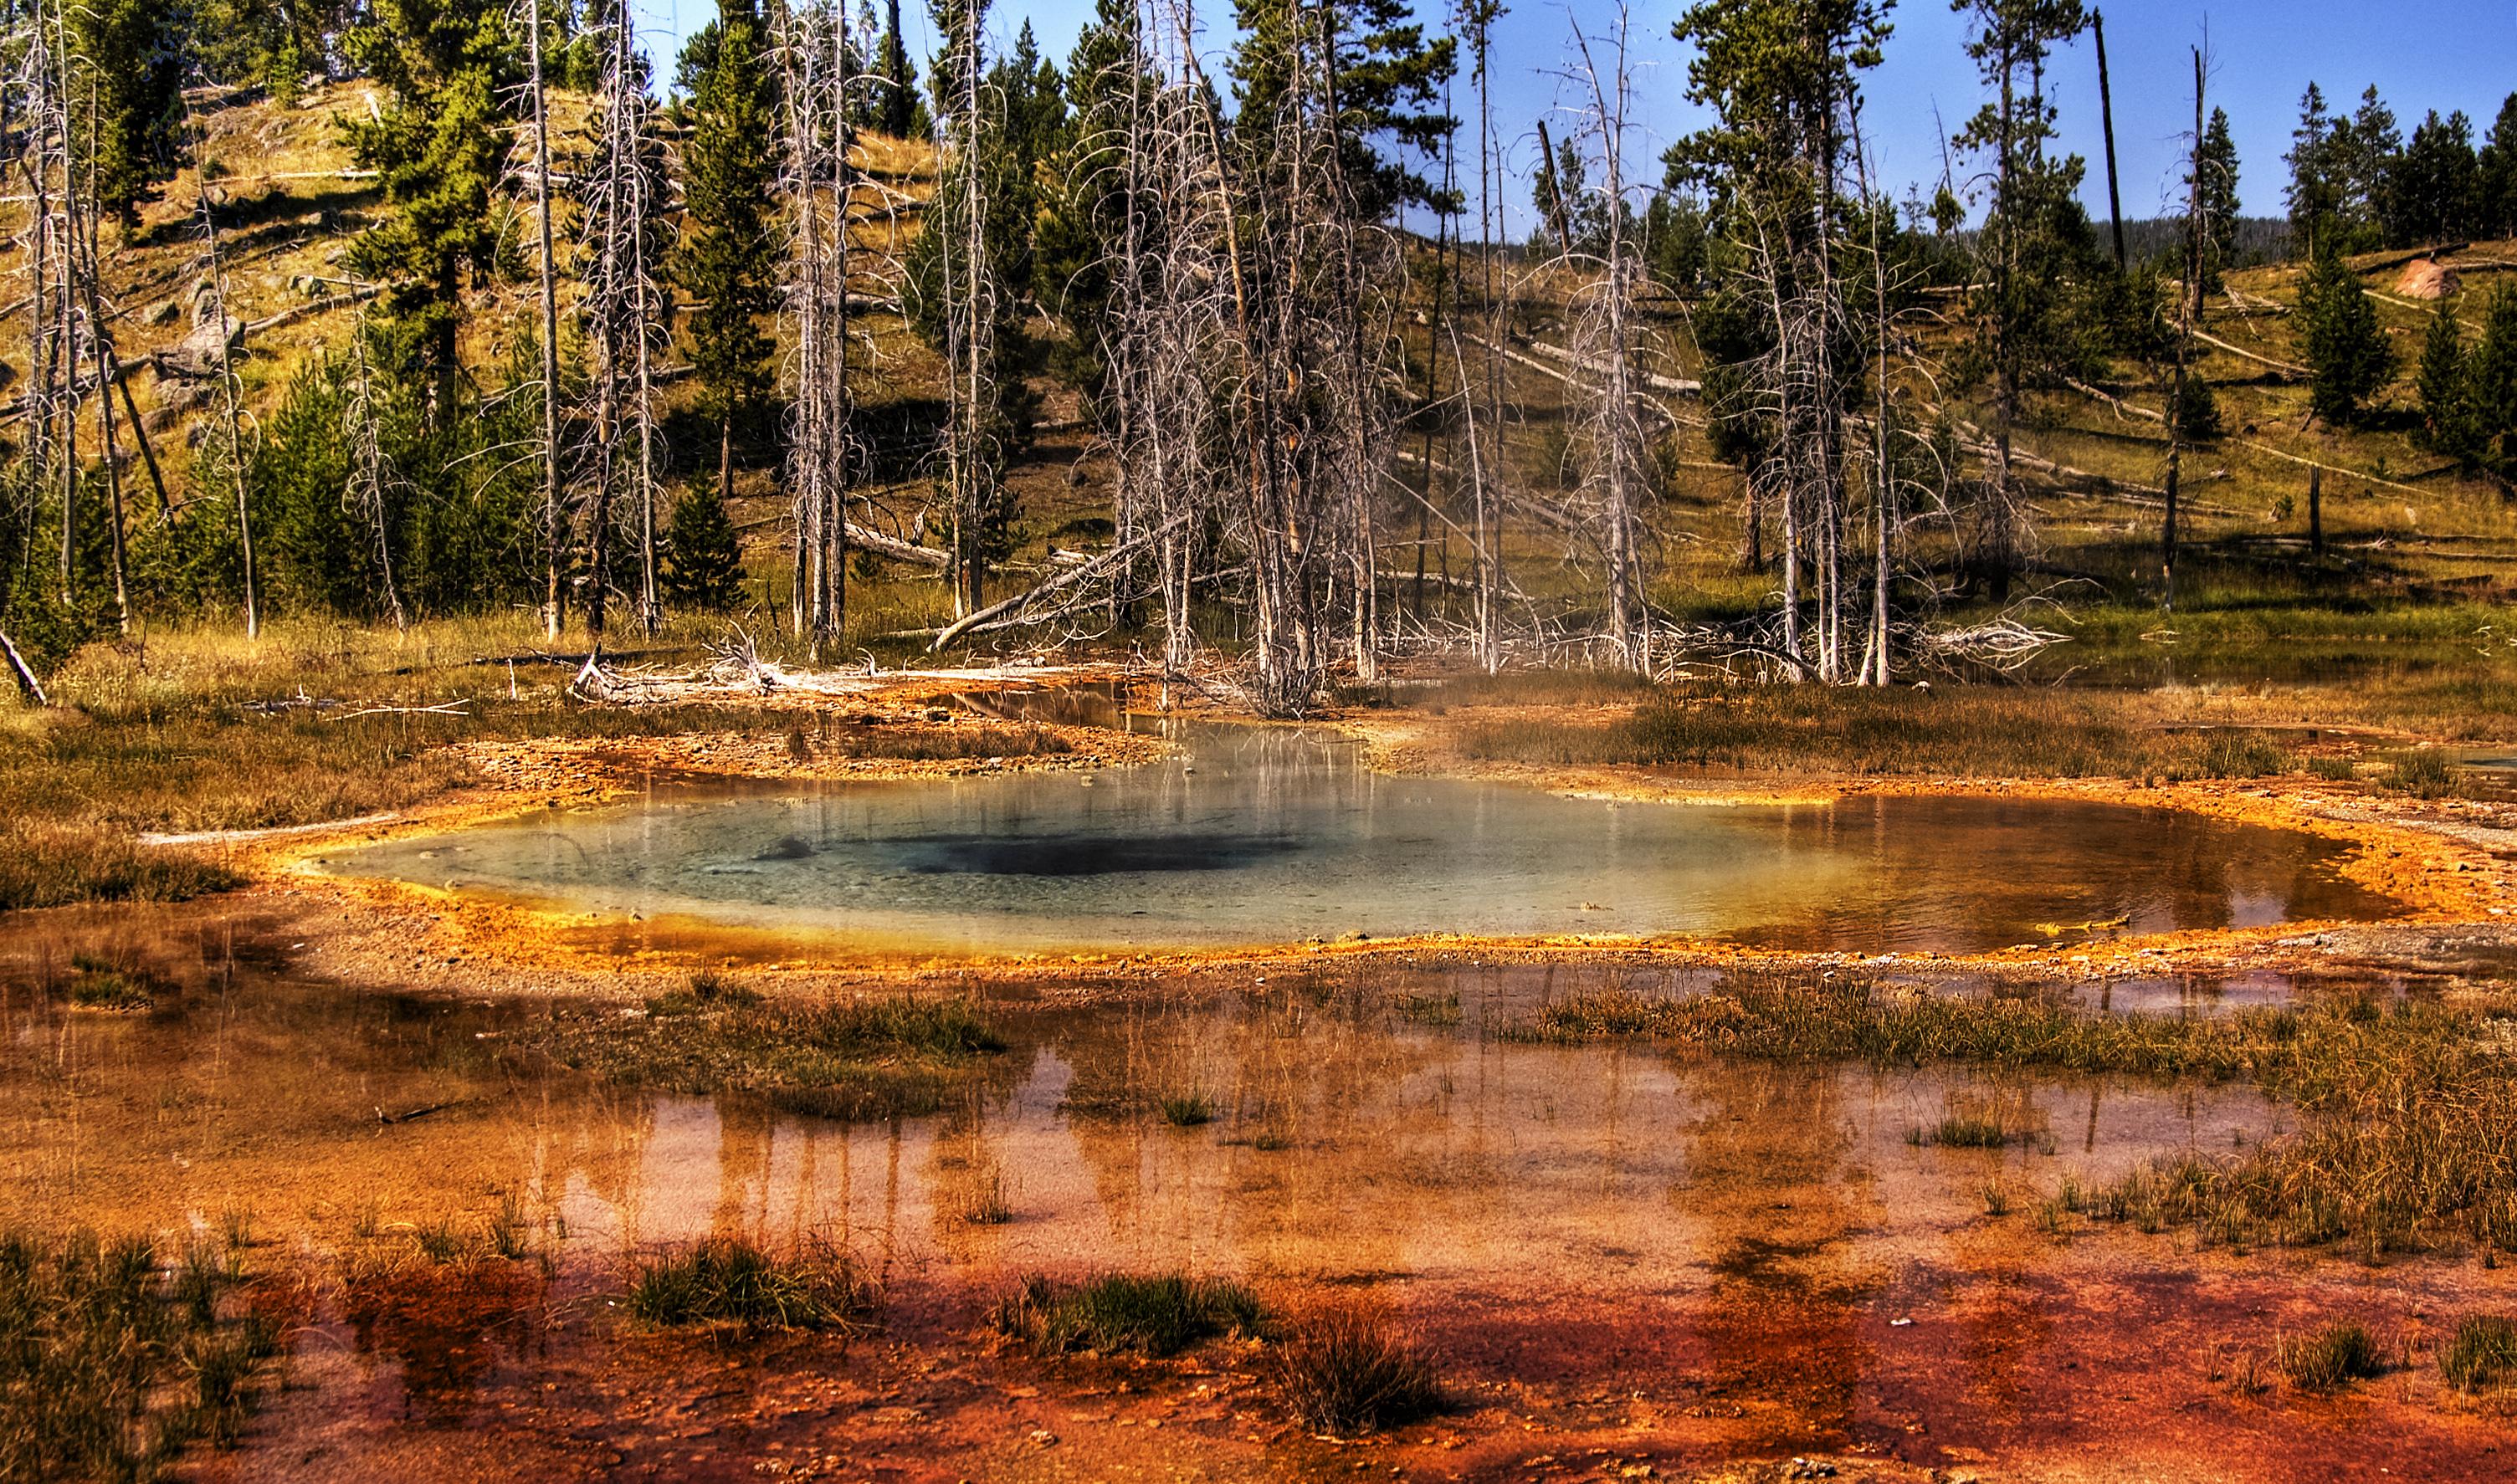 Yellowstone National Park By Emma Harris - Us national parks yellowstone